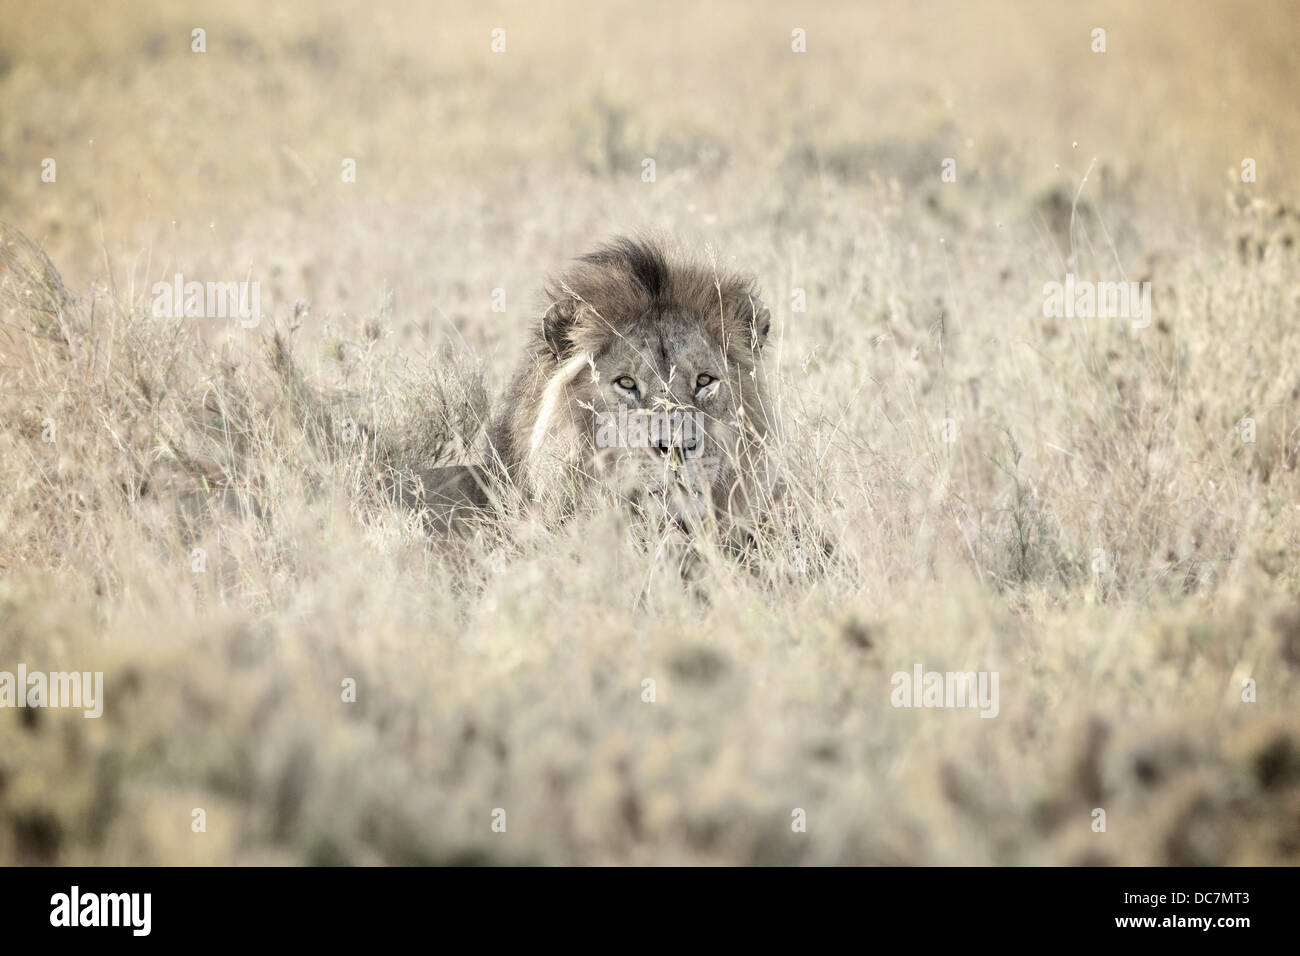 Männlicher Löwe. Serengeti. Tansania Afrika. Stockbild